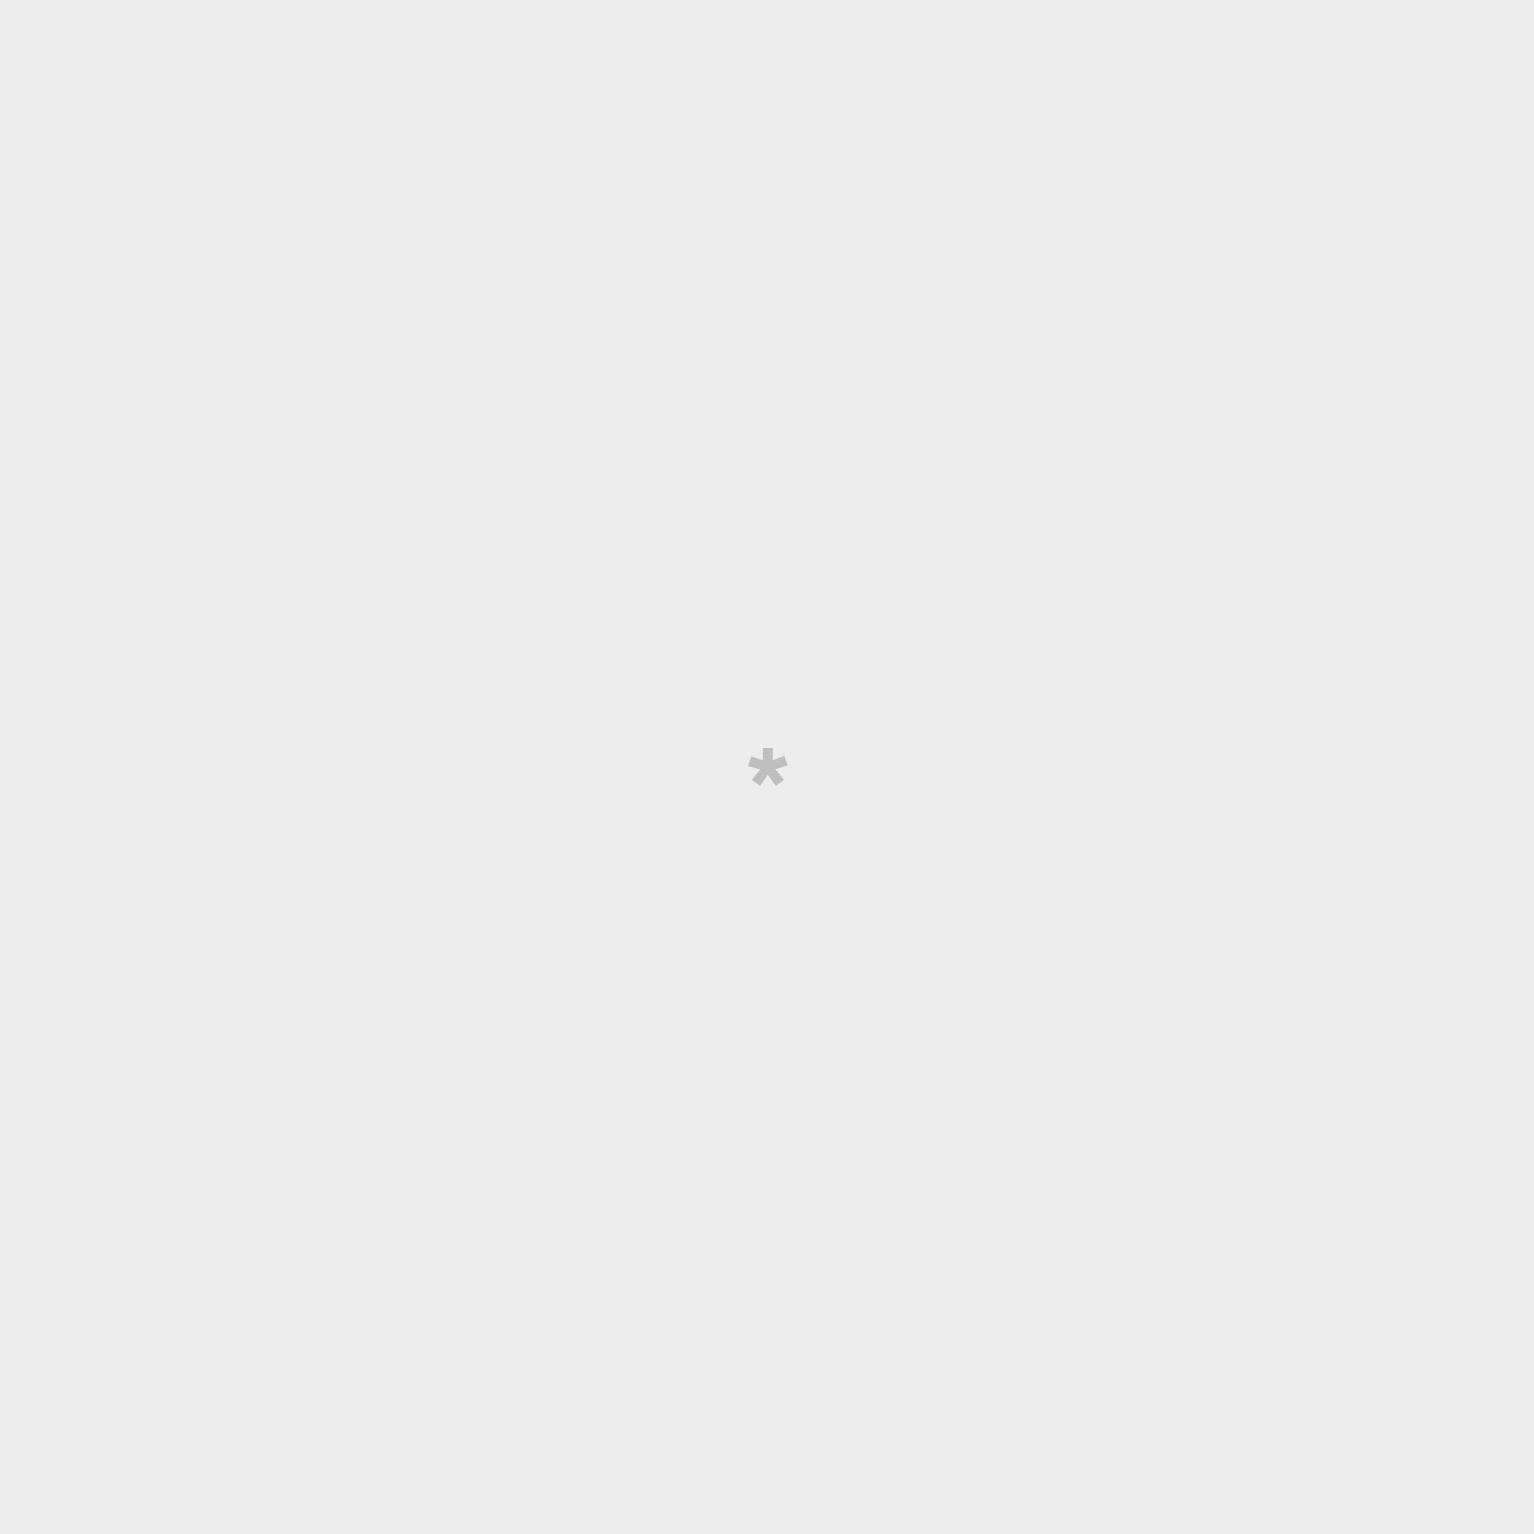 Magnetic whiteboard - Cupcake